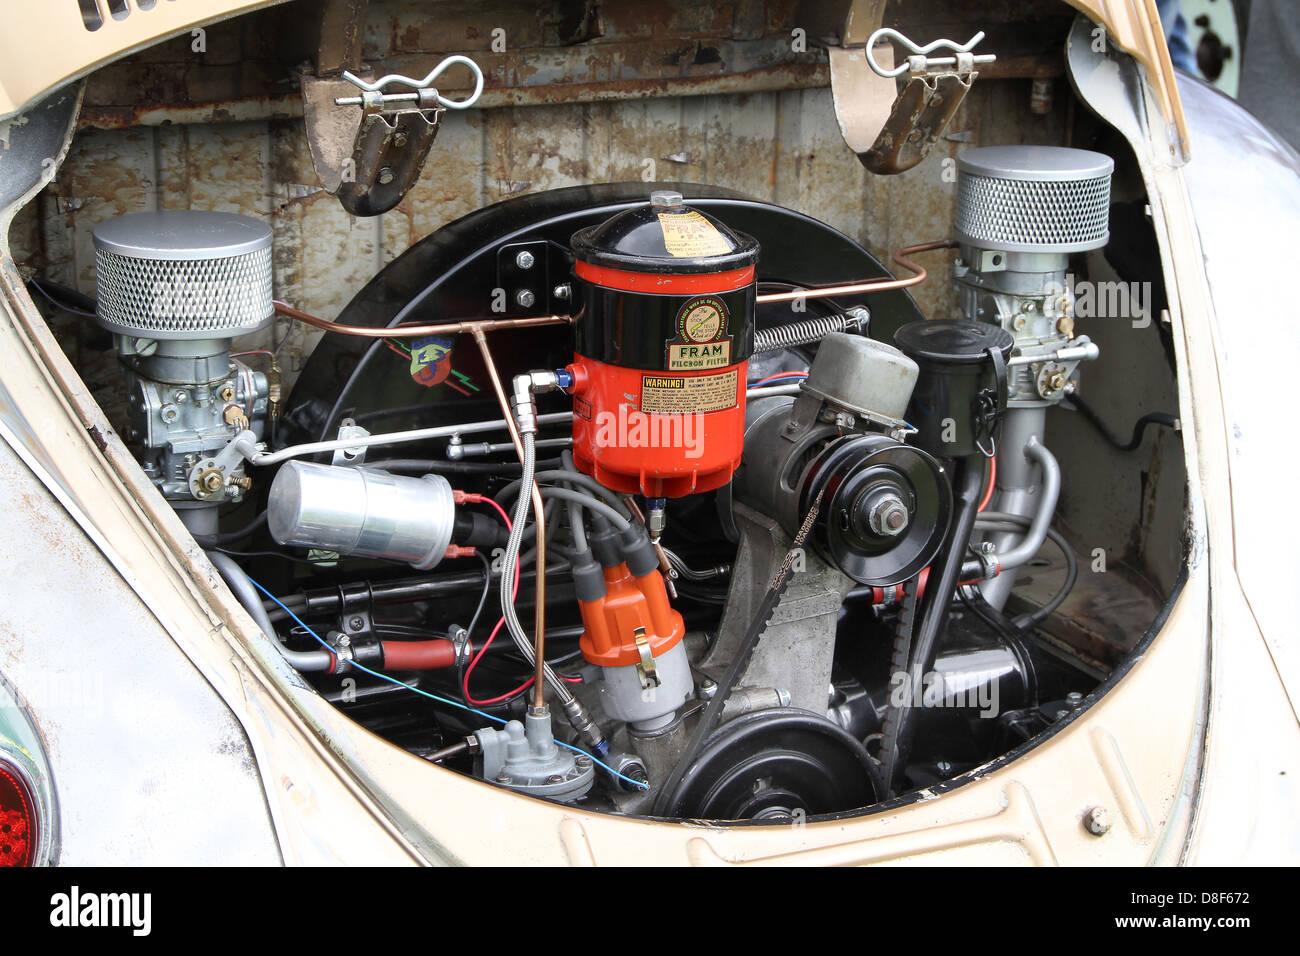 Vw Beetle Engine Bay Stock Photo Alamy